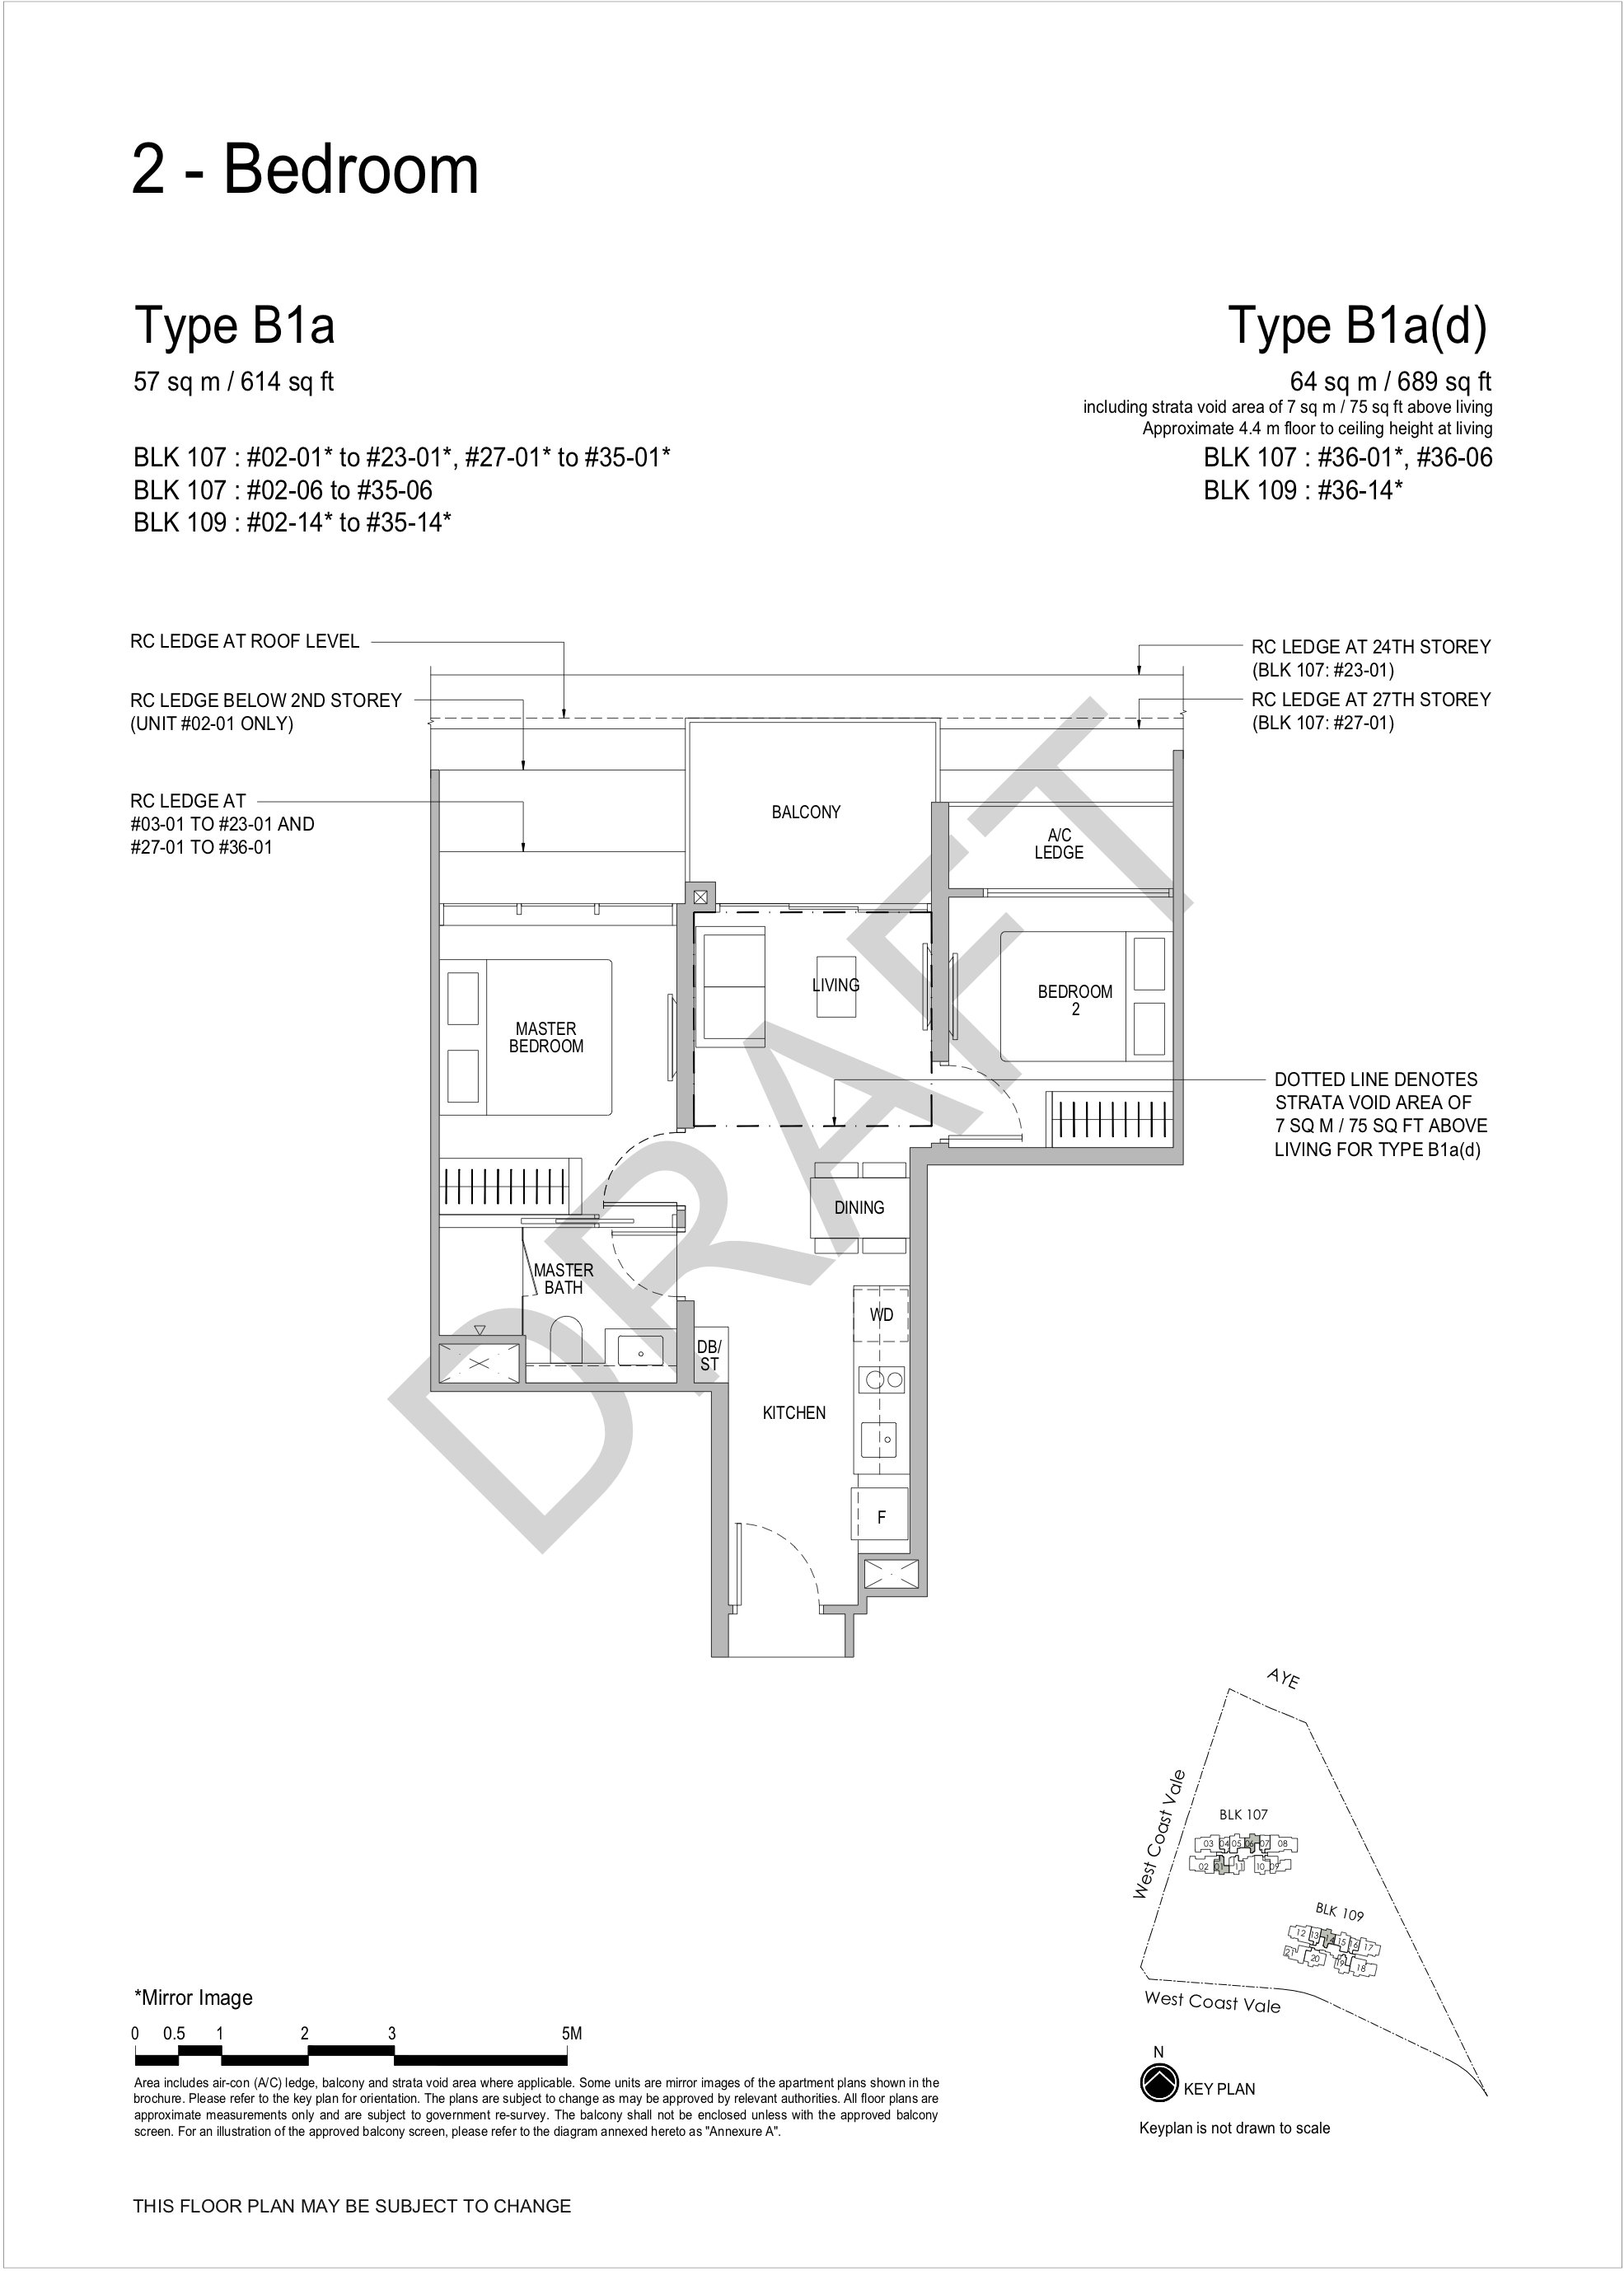 Whistler Grand 2 bedroom floor plan B1a